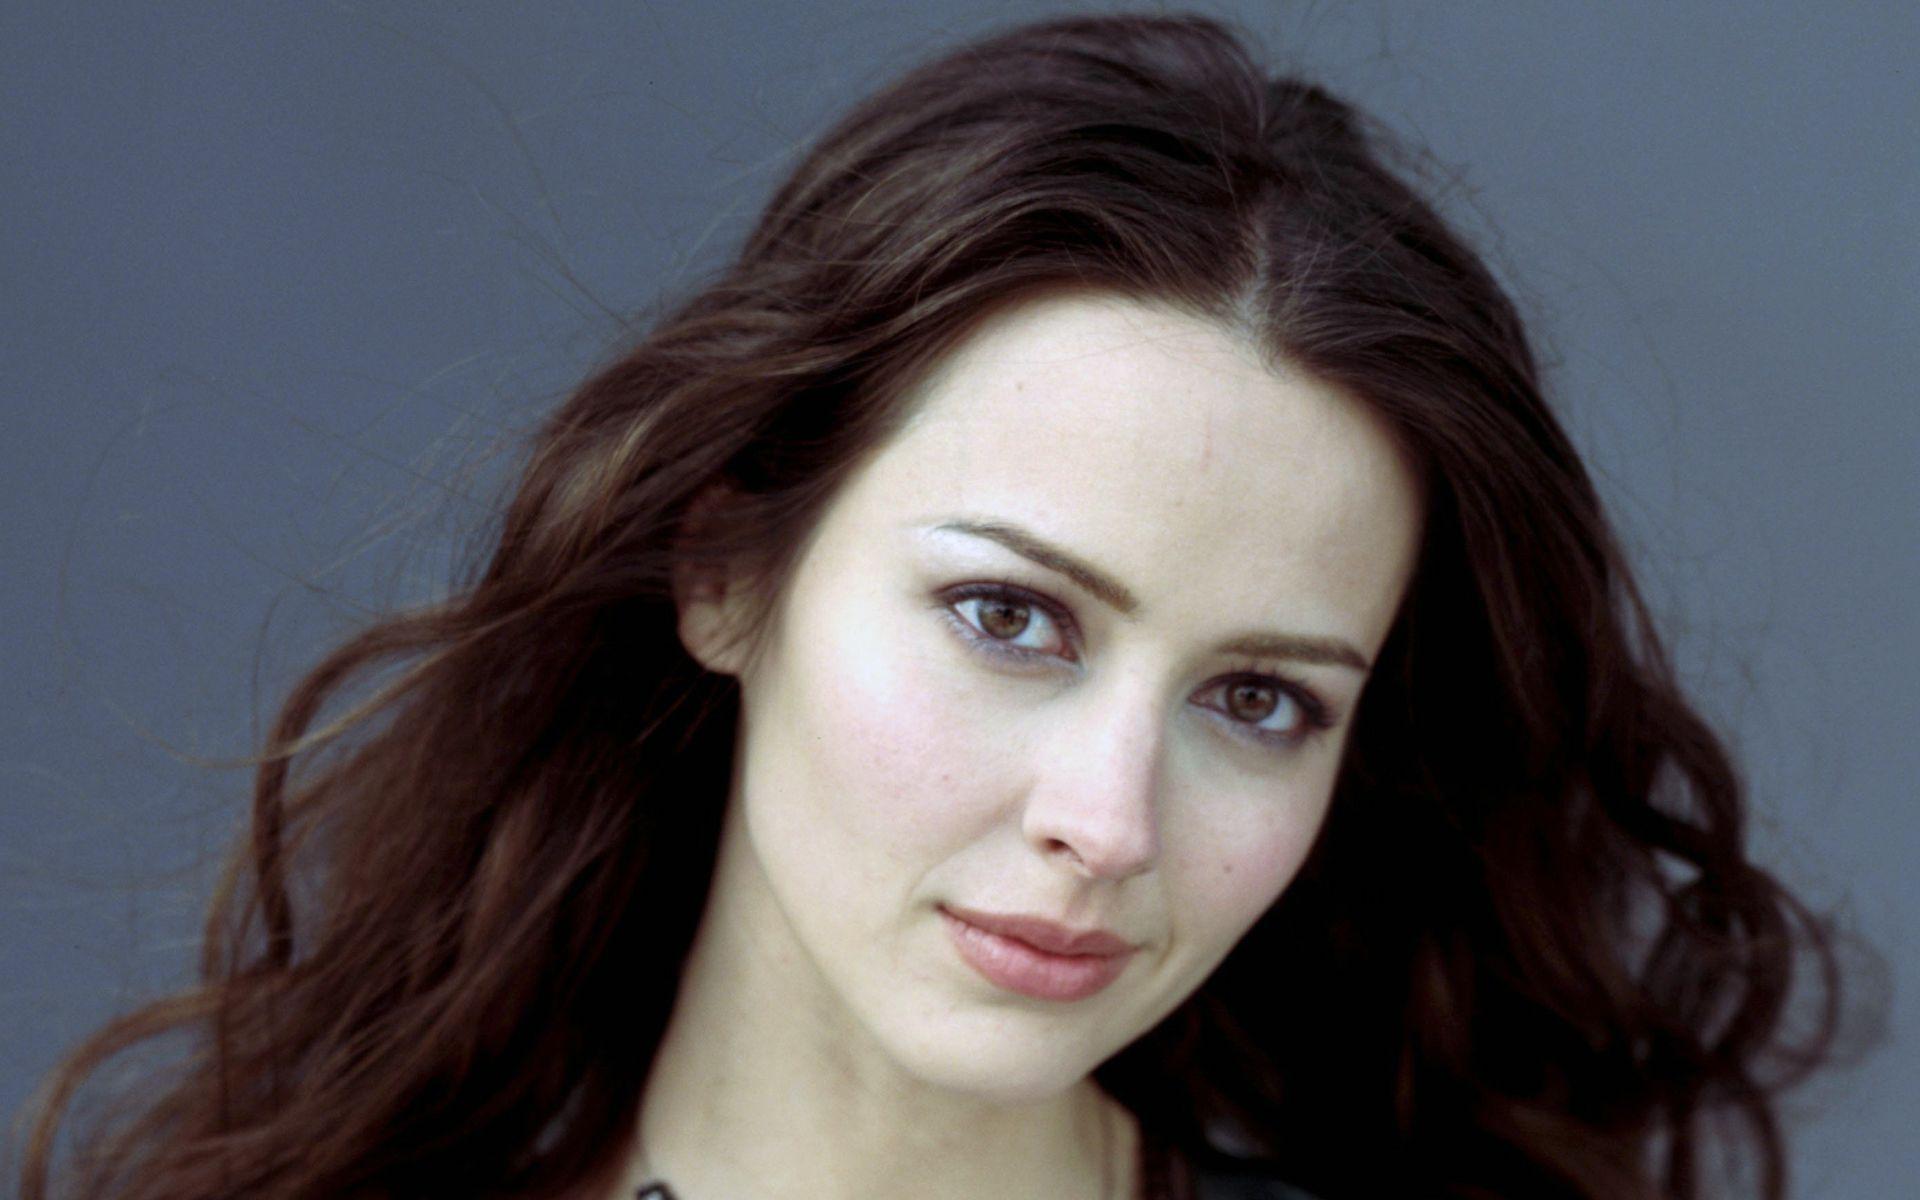 picture Amy Acker born December 5, 1976 (age 41)